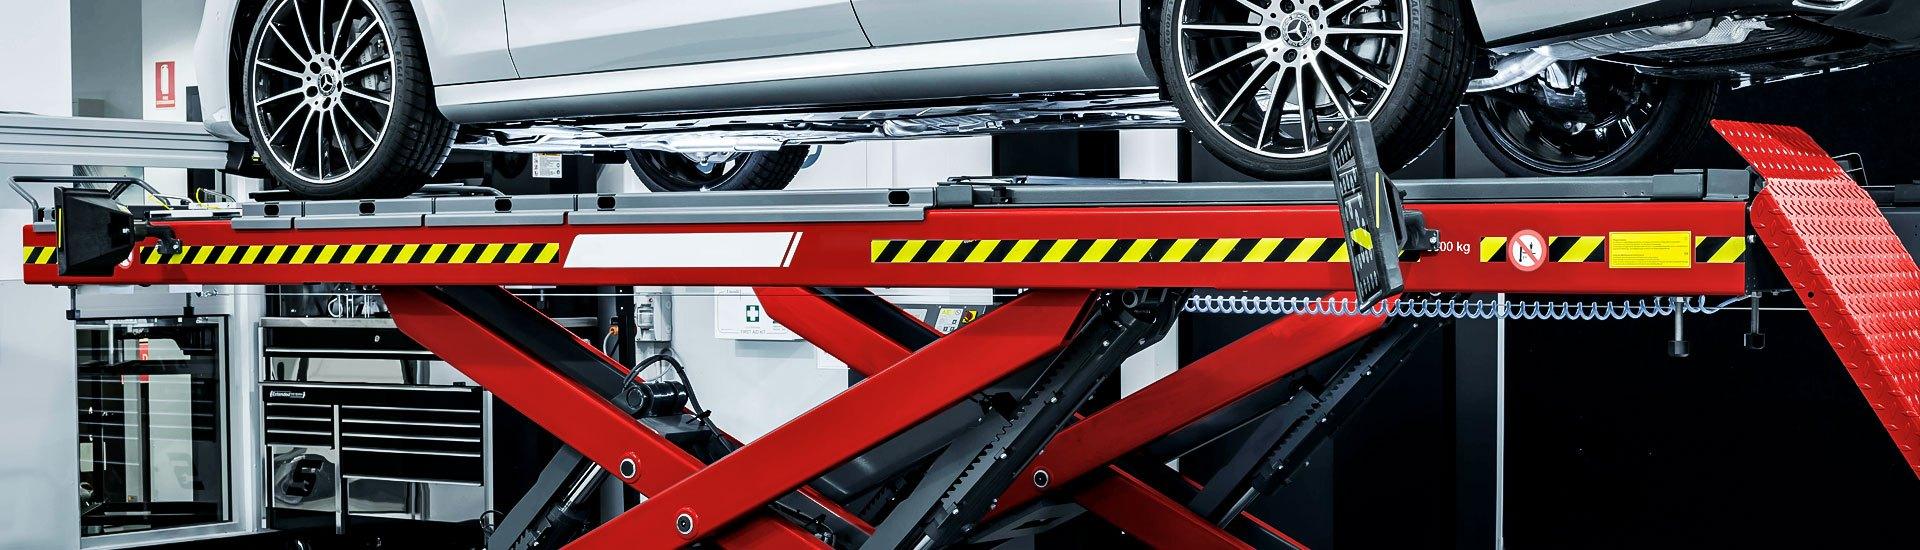 Automotive Lifts & Stands